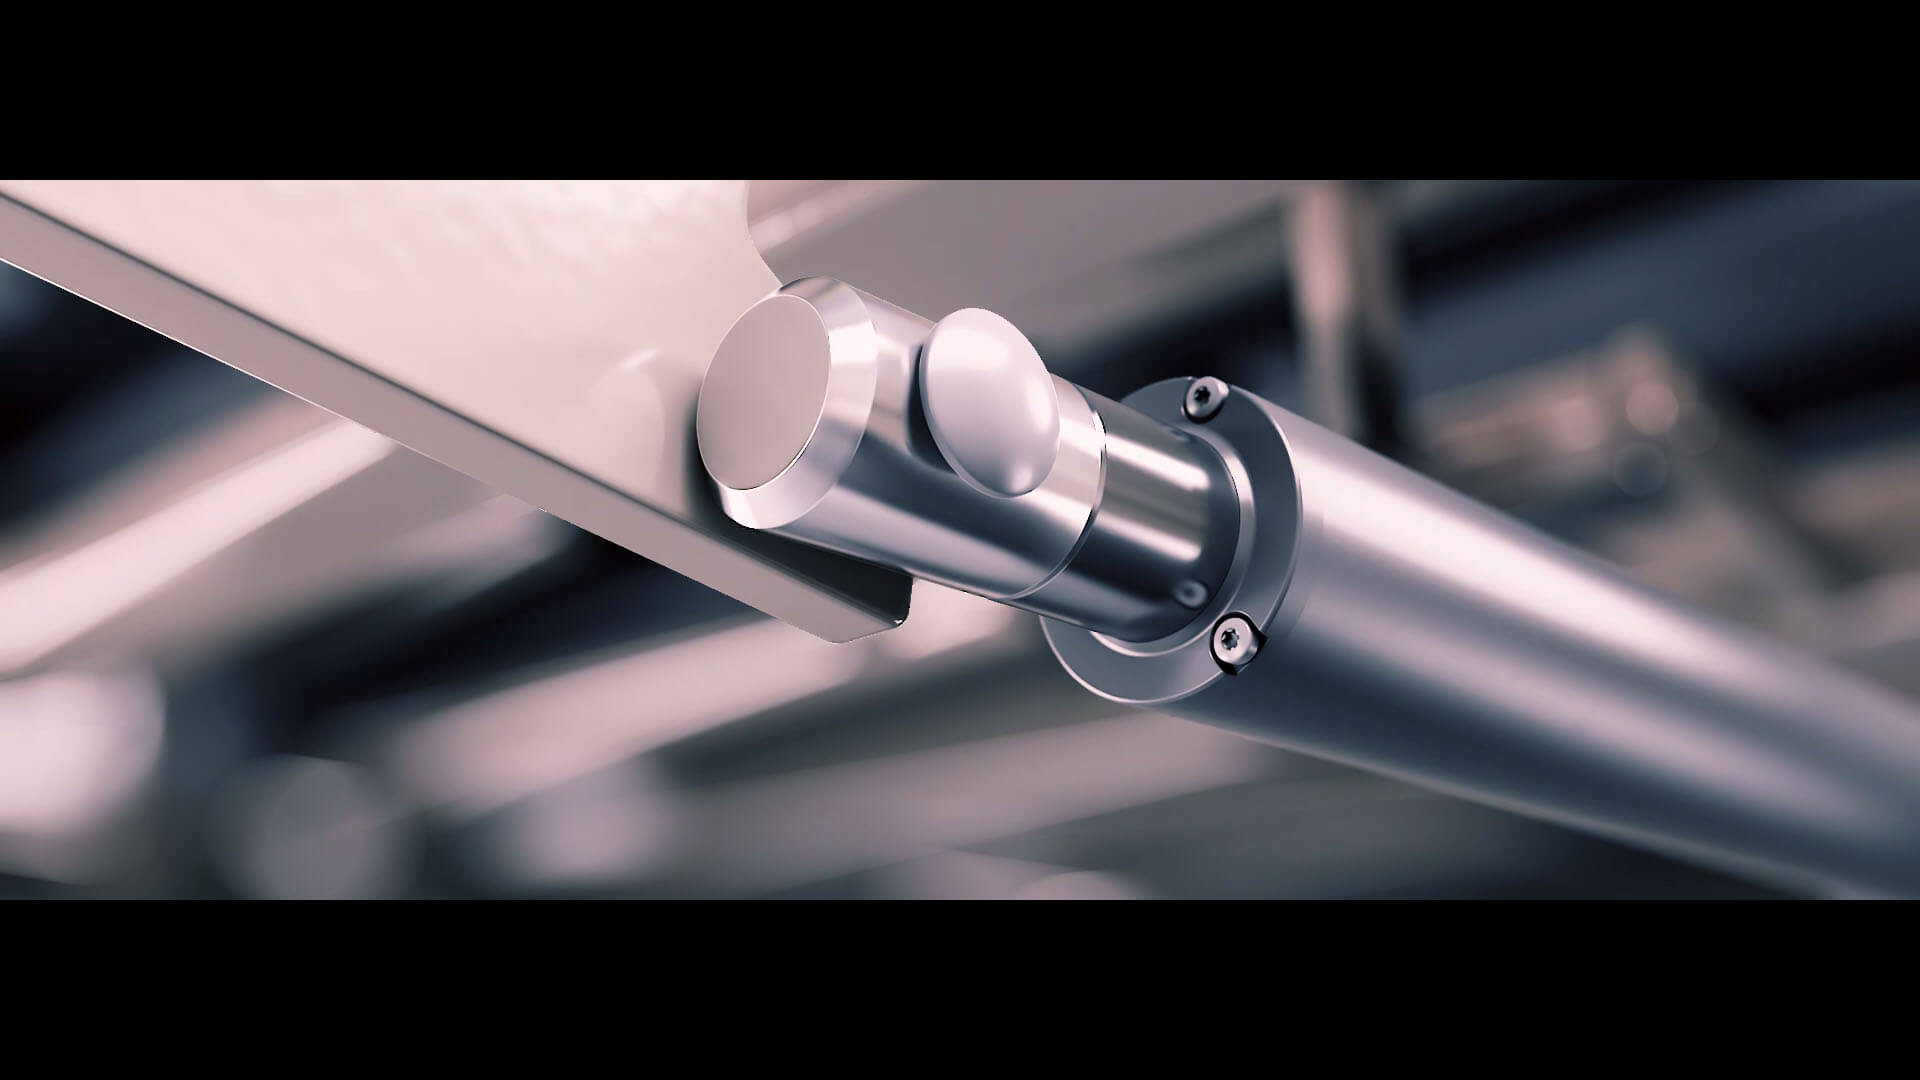 LINAK - 전동 액추에이터 기술의 본거지